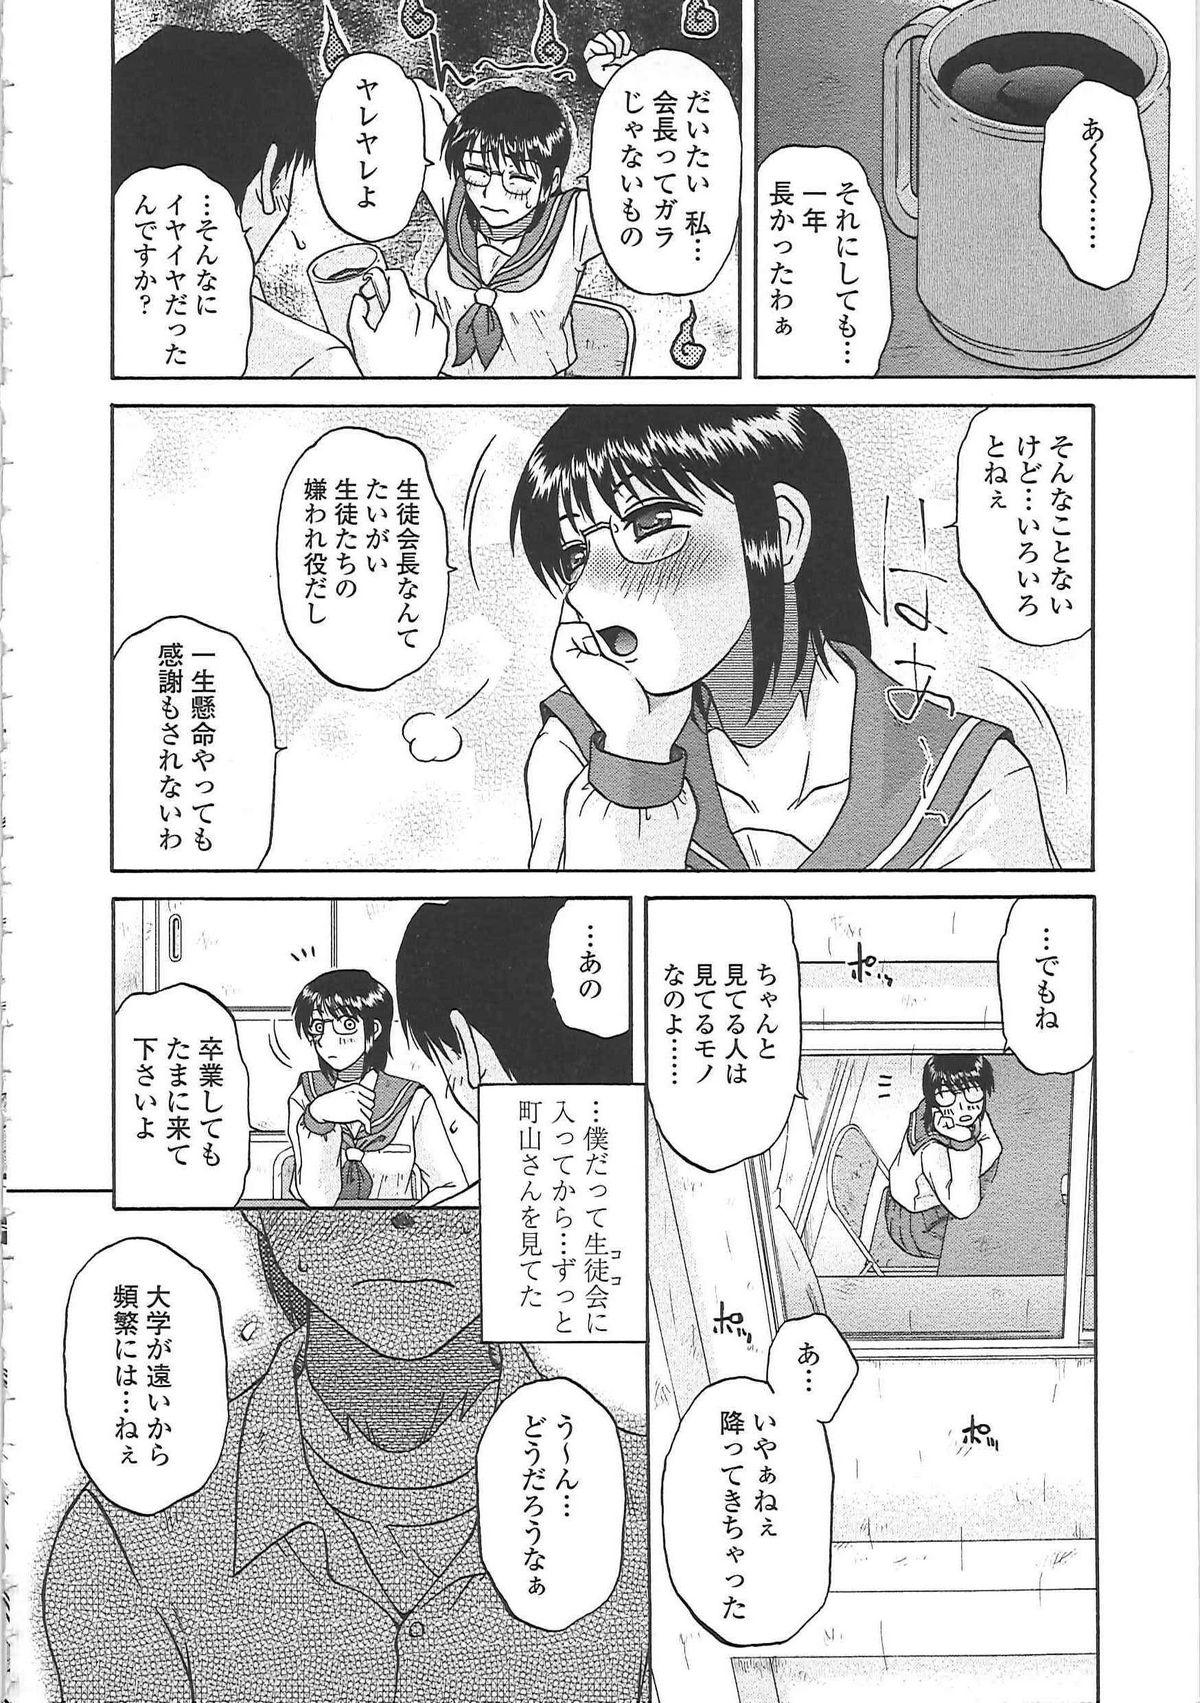 Nikuzuma Tsuushin - Erotic Wife Communication 80